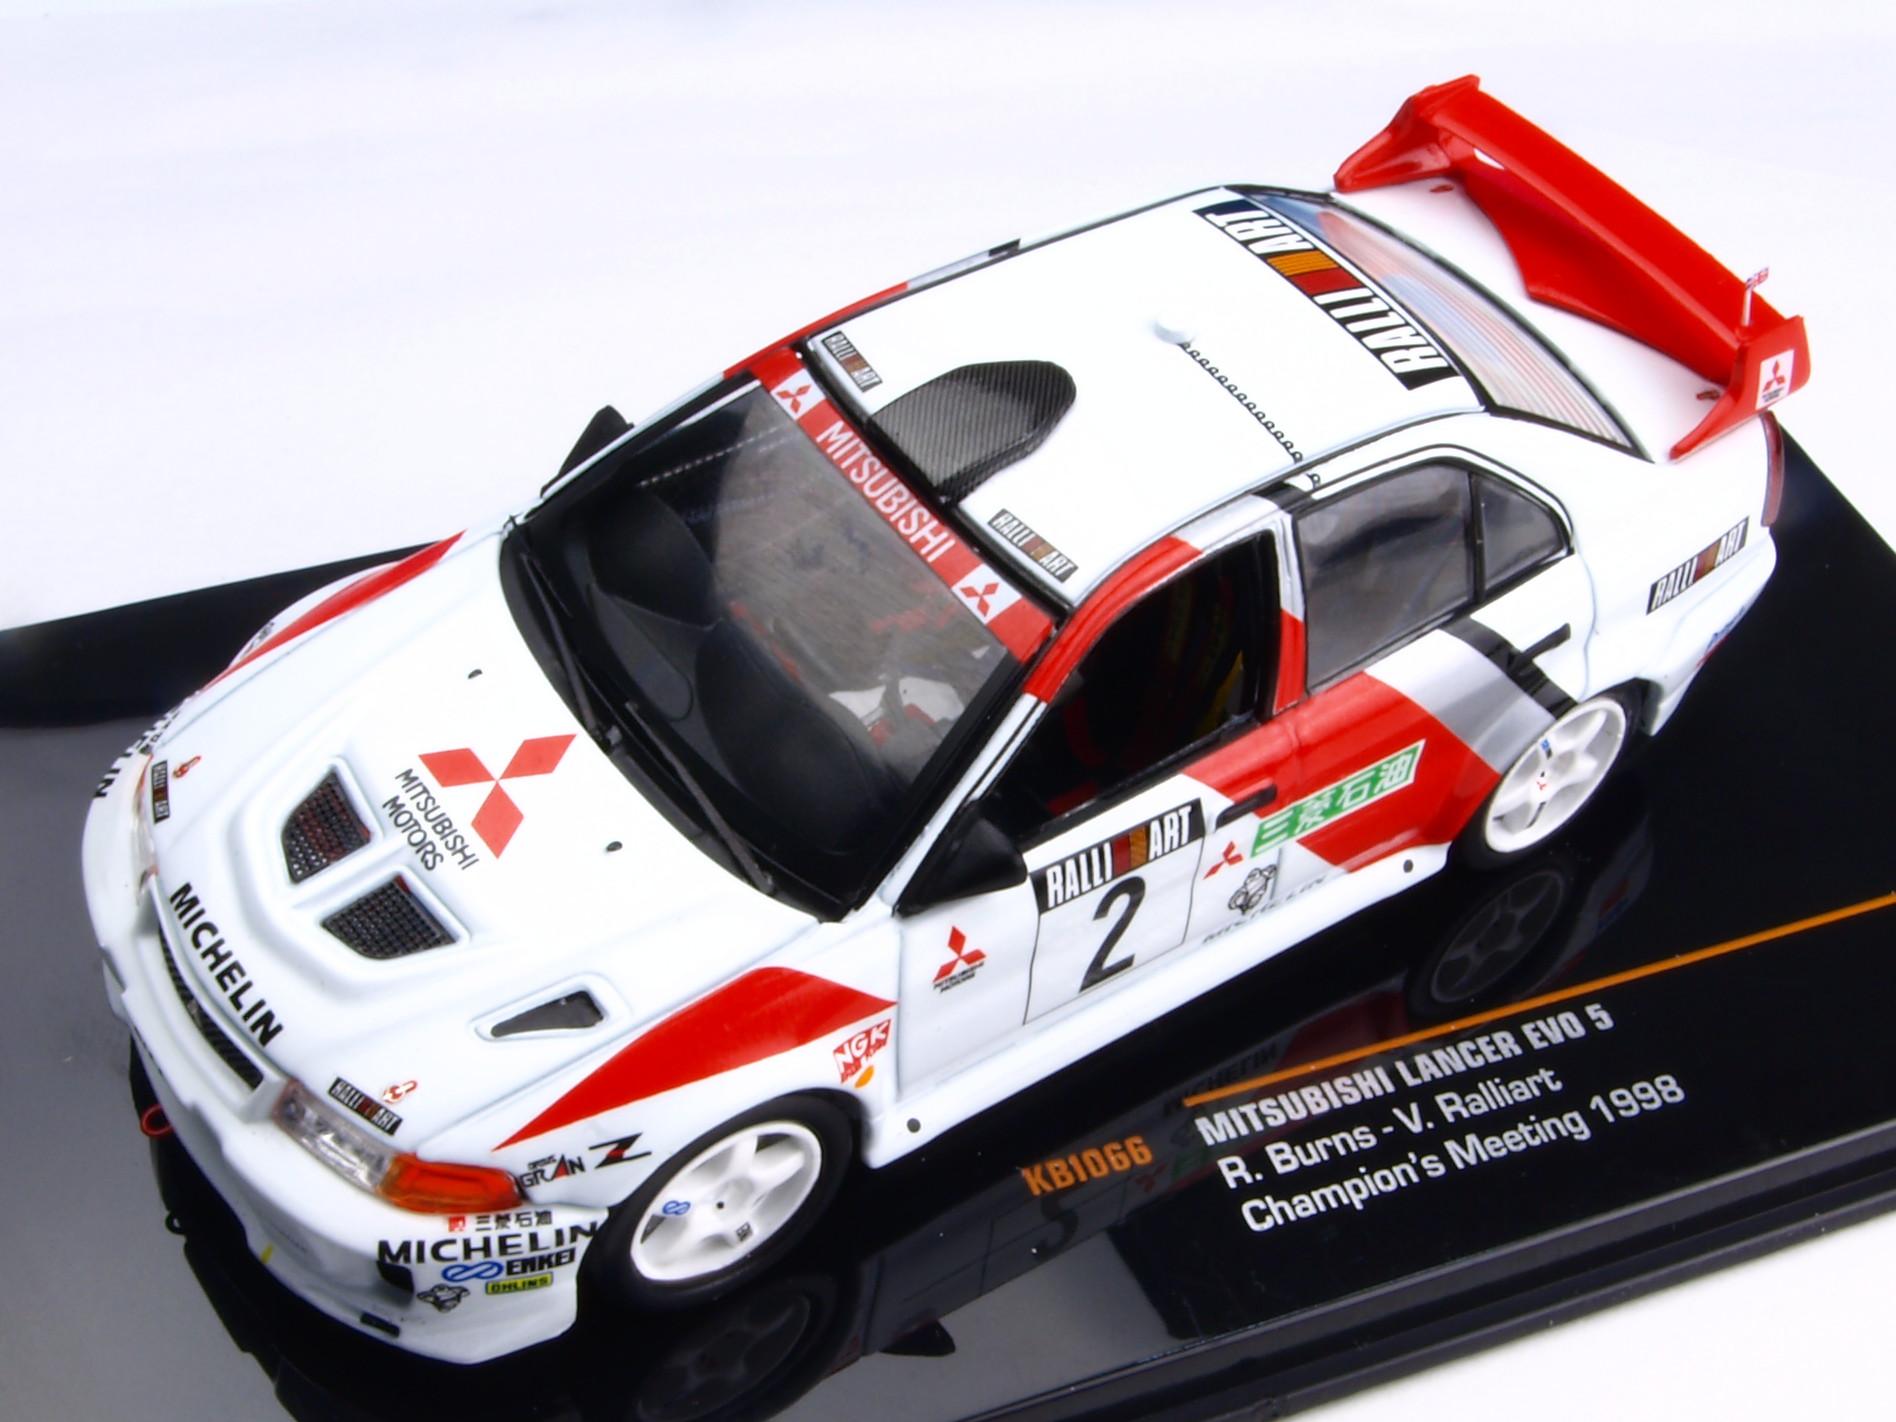 KBモデル(イクソ) 三菱 ランサー EVO V  1998年 ラリーアート・ミーティング #2 R.バーンズ